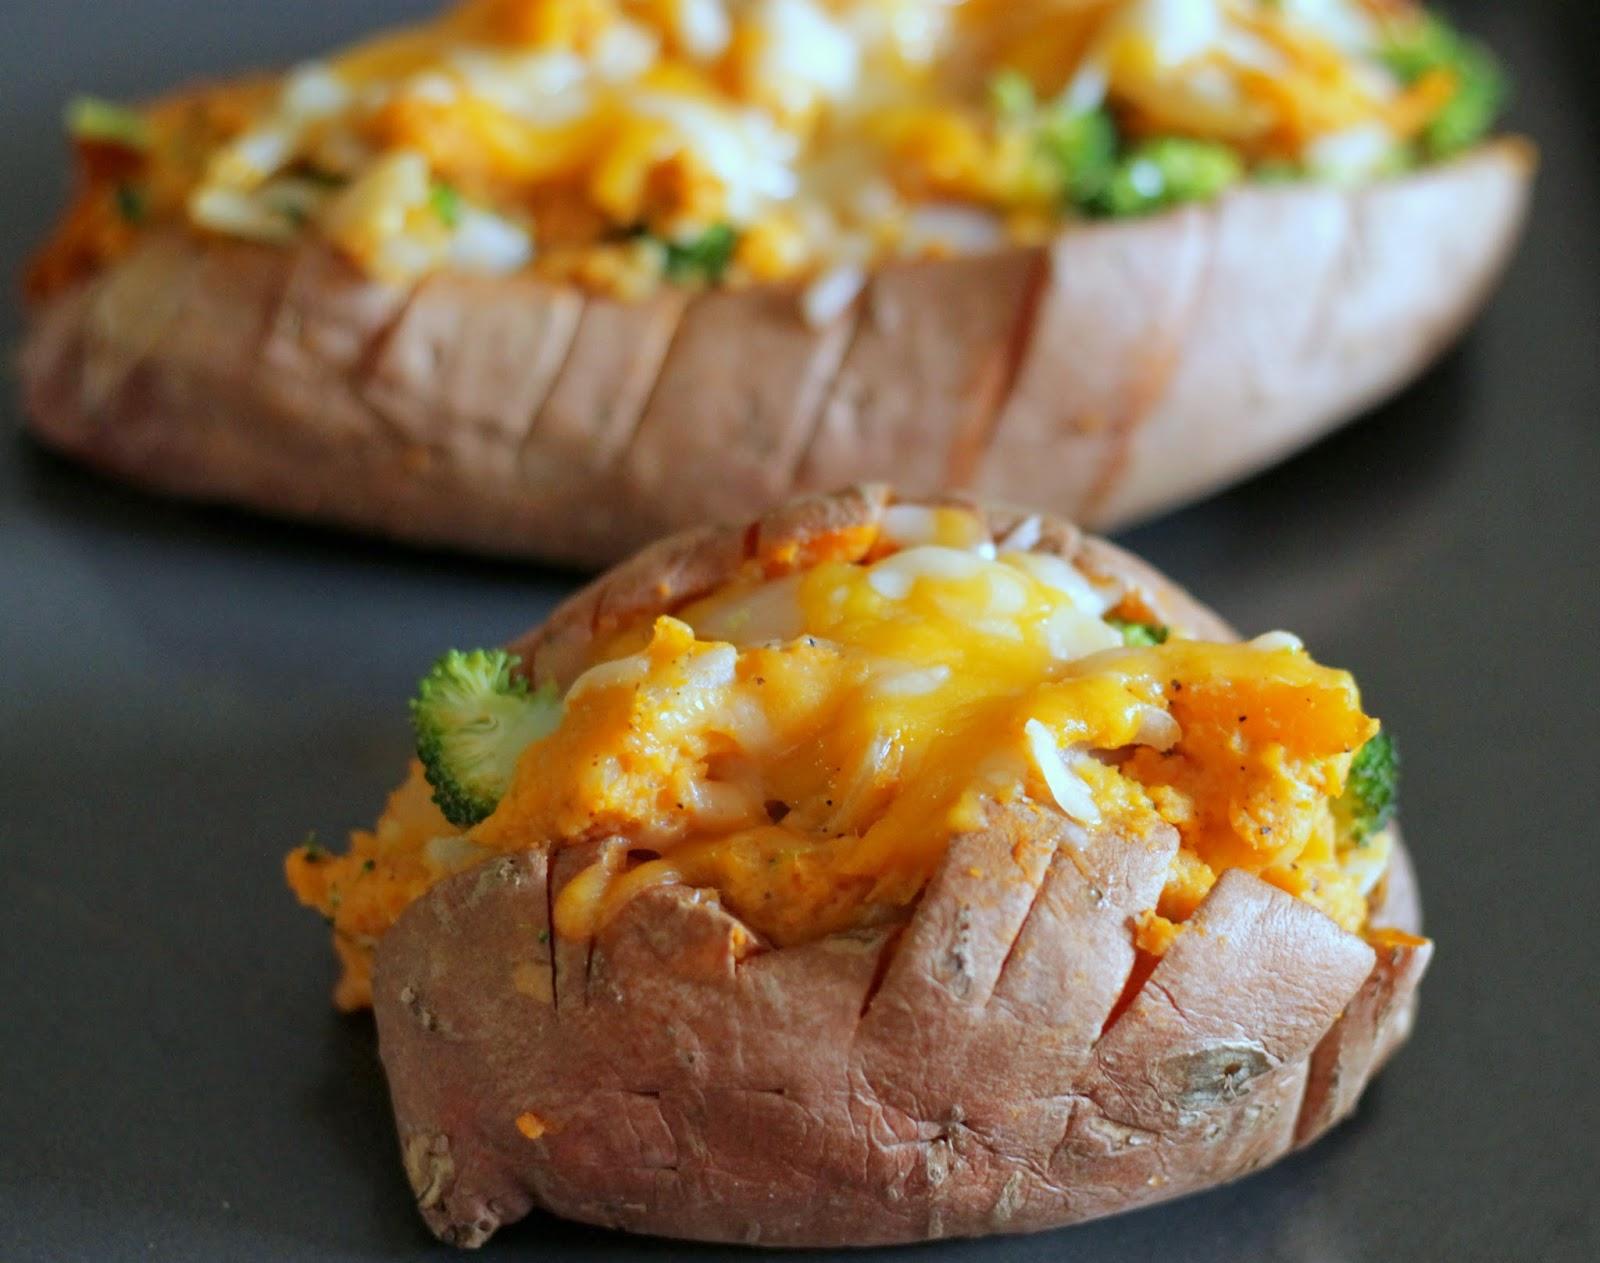 Broccoli And Cheese Twice Baked Potatoes Recipe — Dishmaps